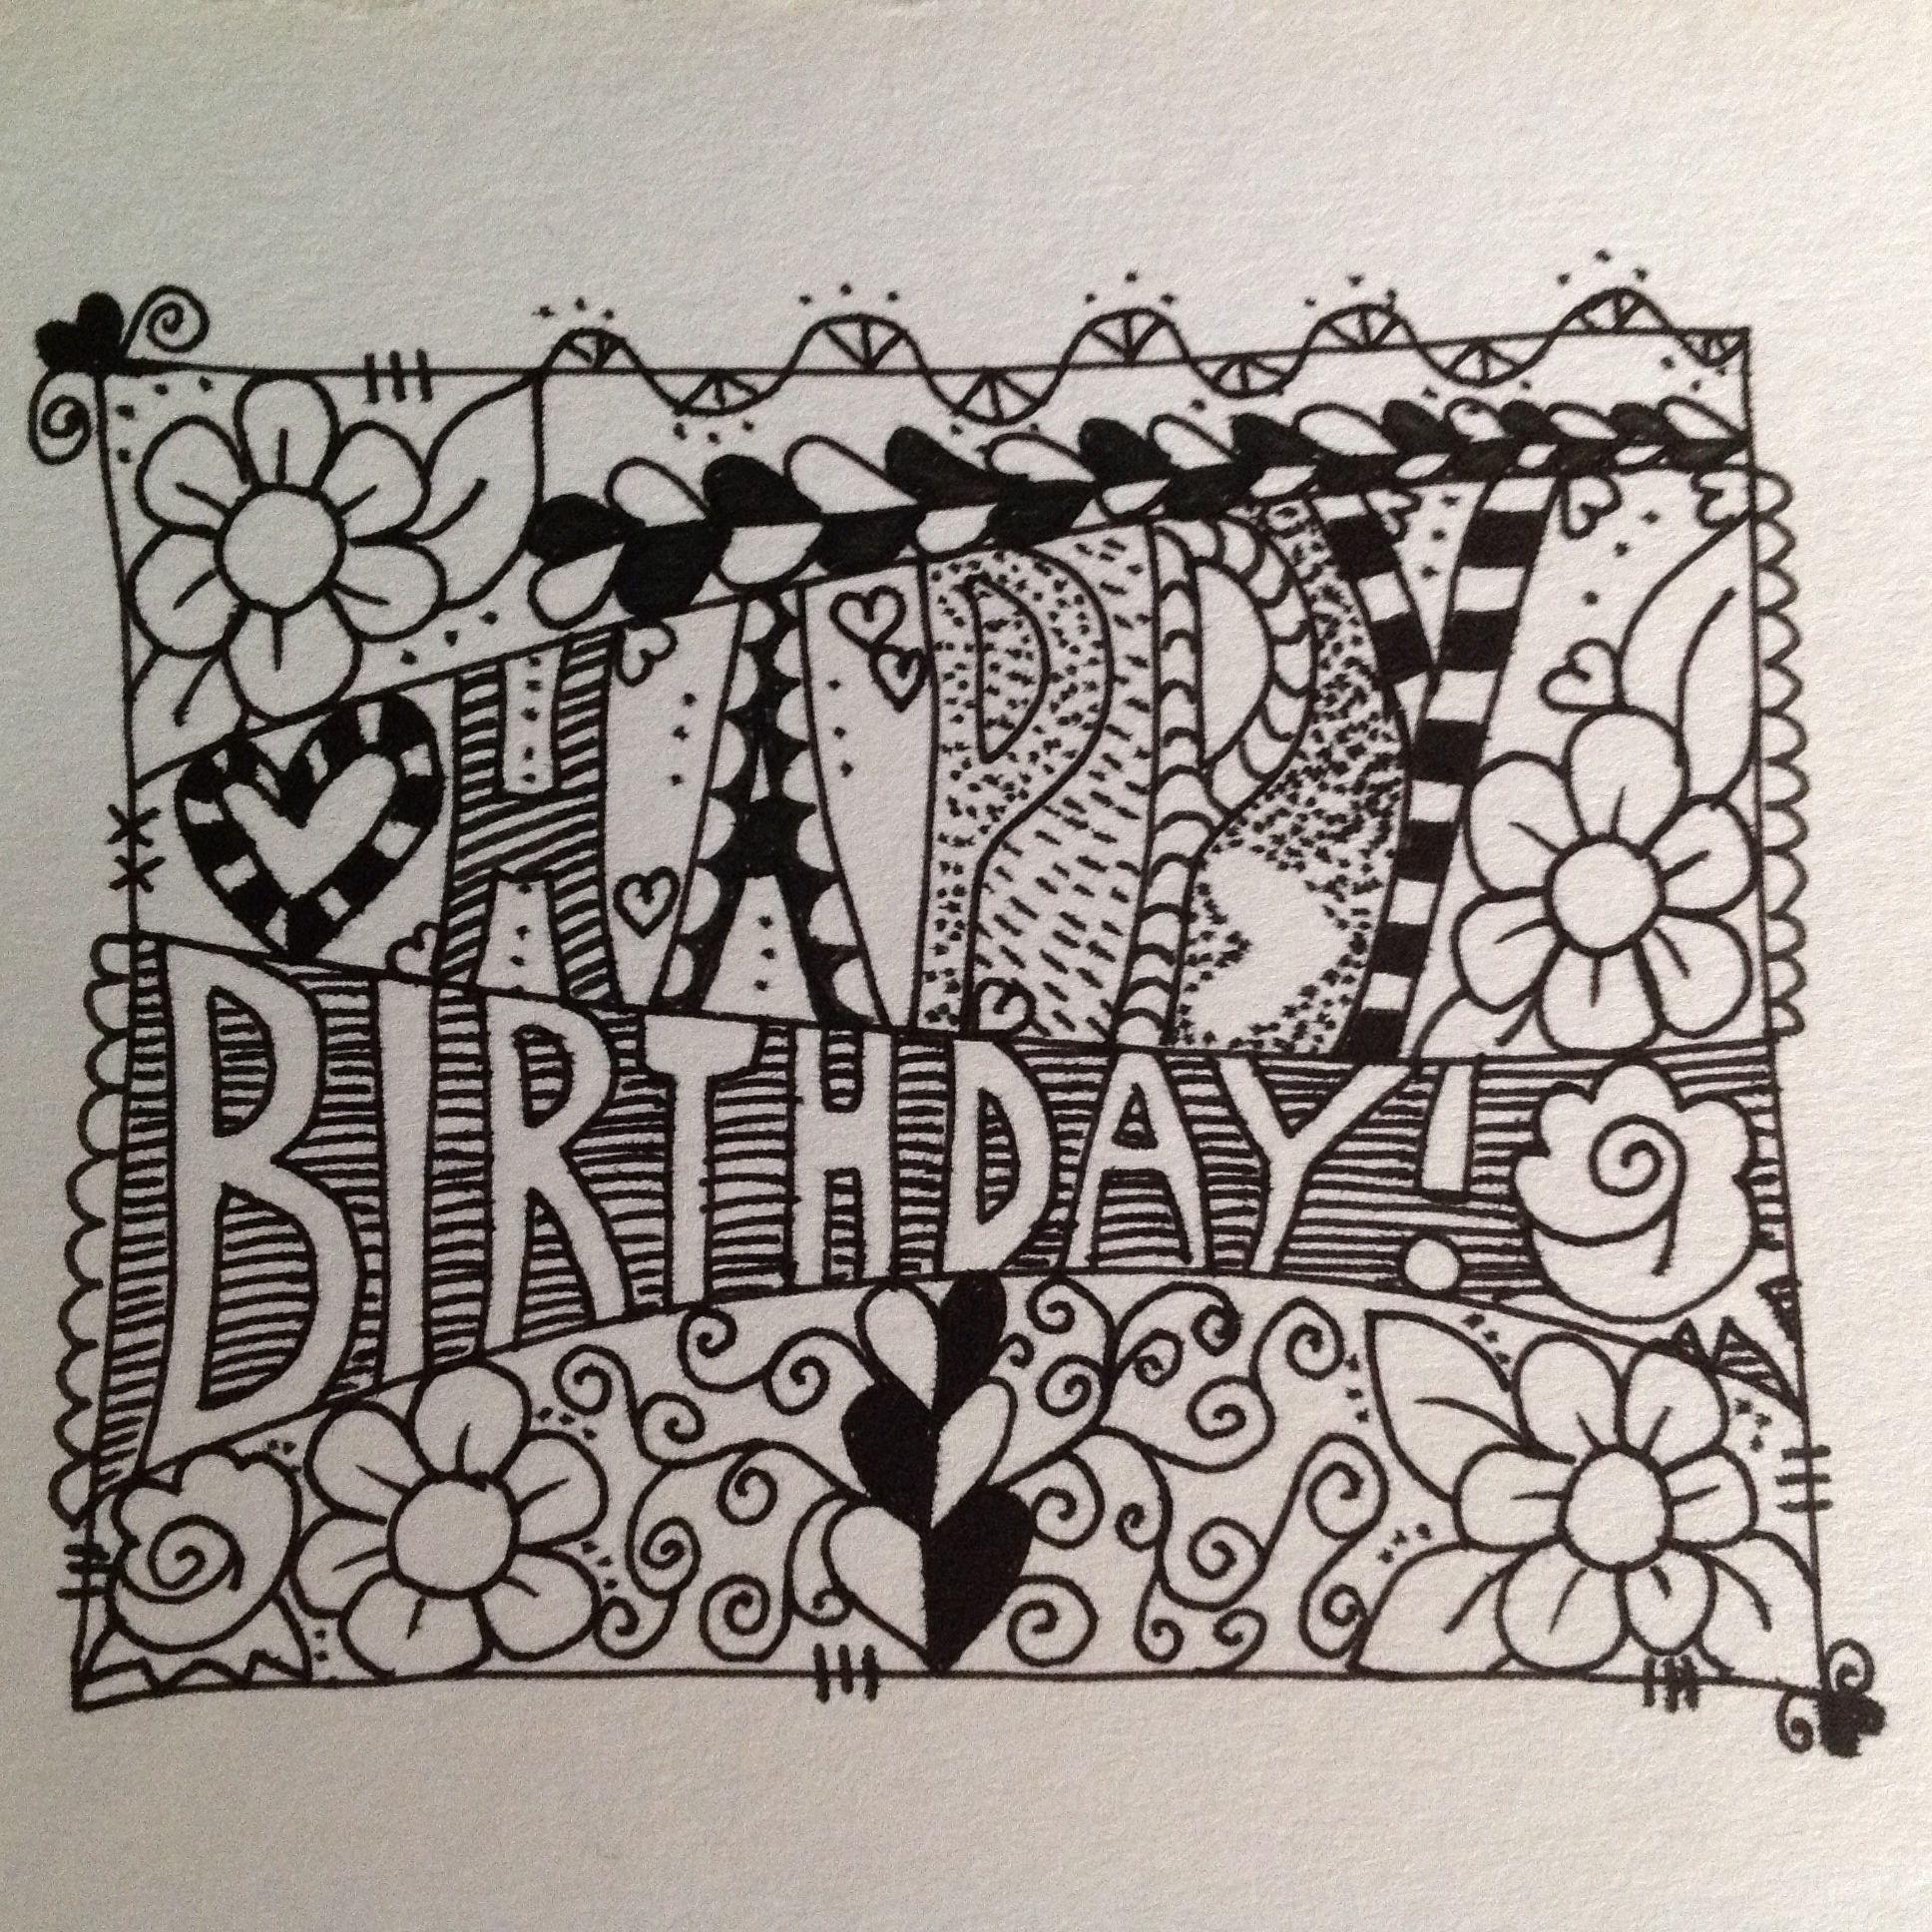 Image Title Zentangle Art Zentangle Drawings Doodles Zentangles